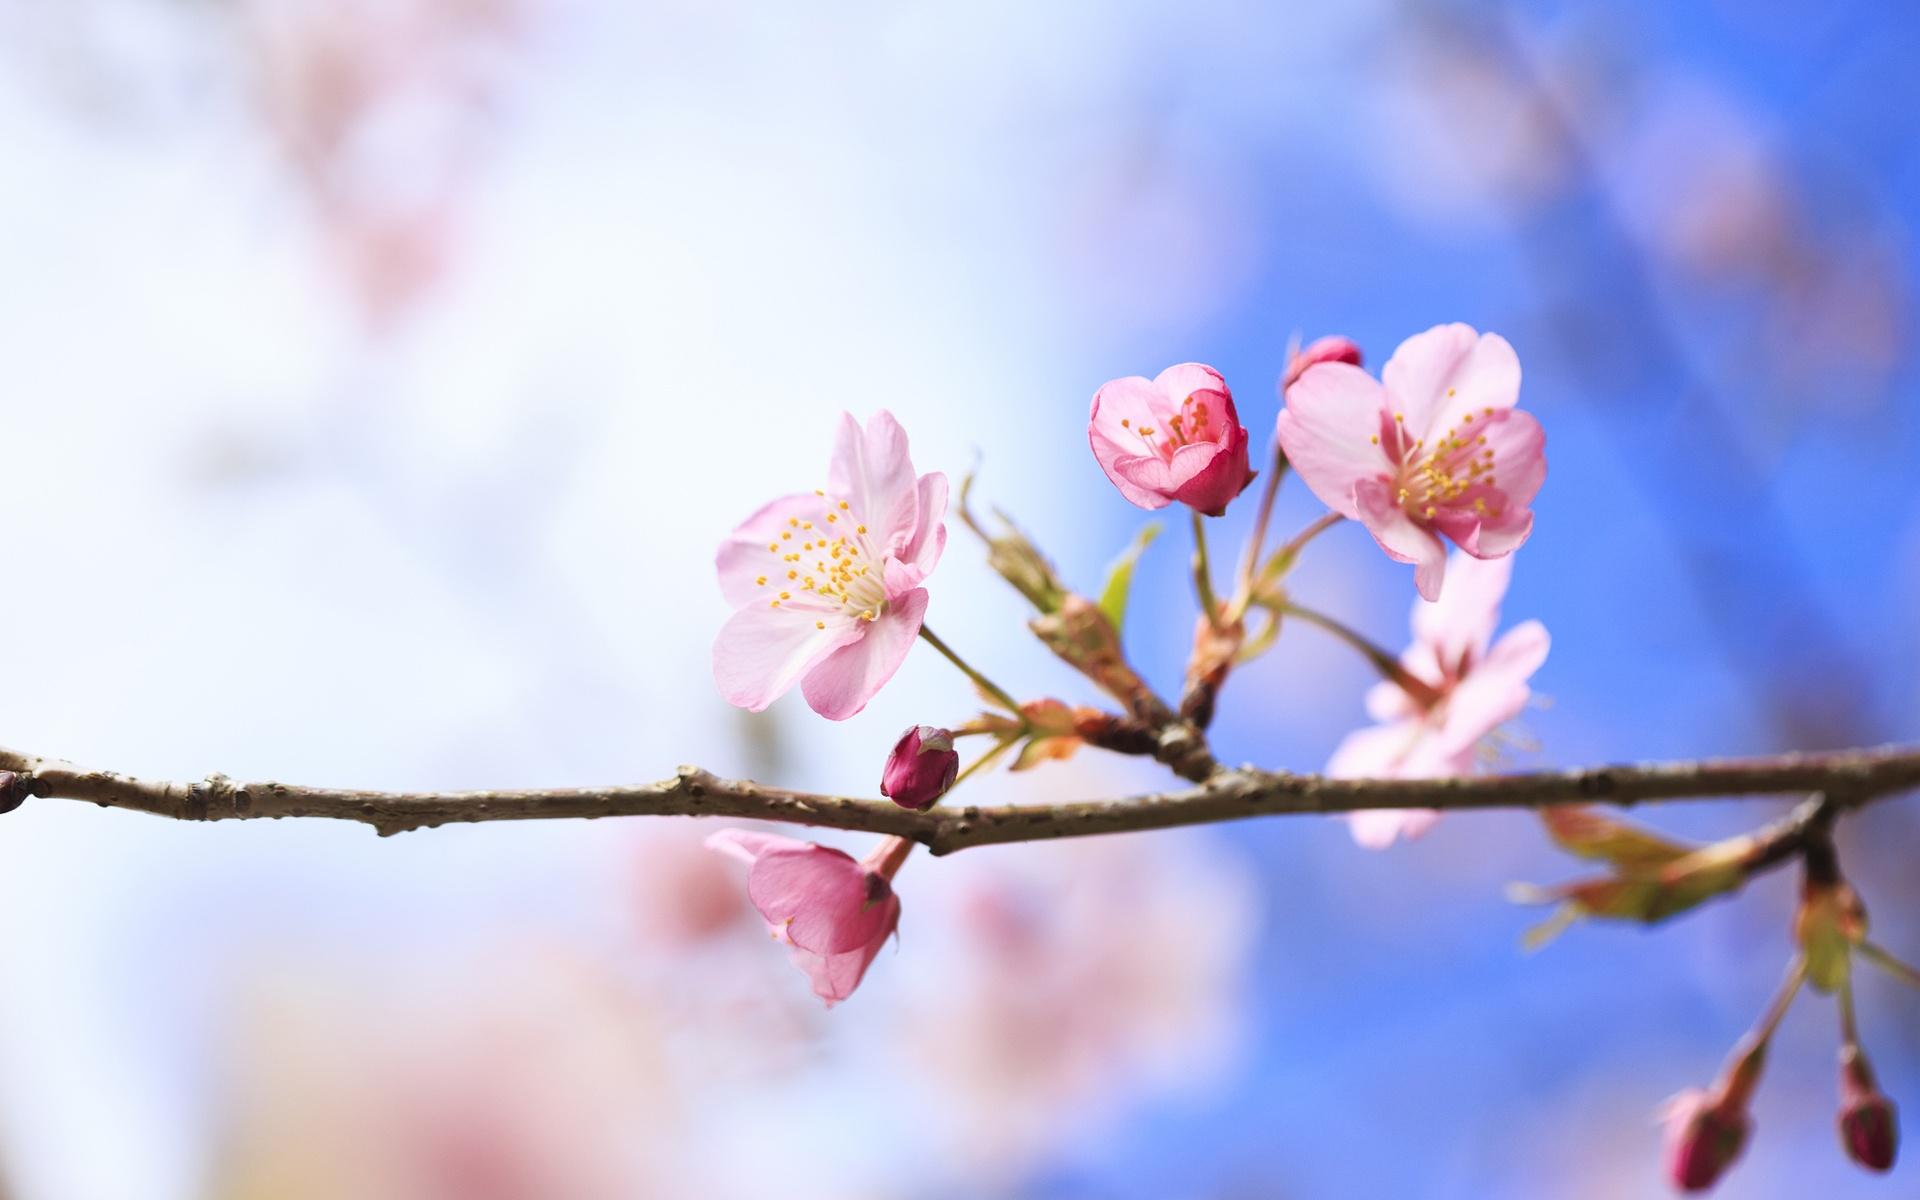 Fondos de pantalla spring cherry blossoms primer plano - Best primer for wallpaper ...